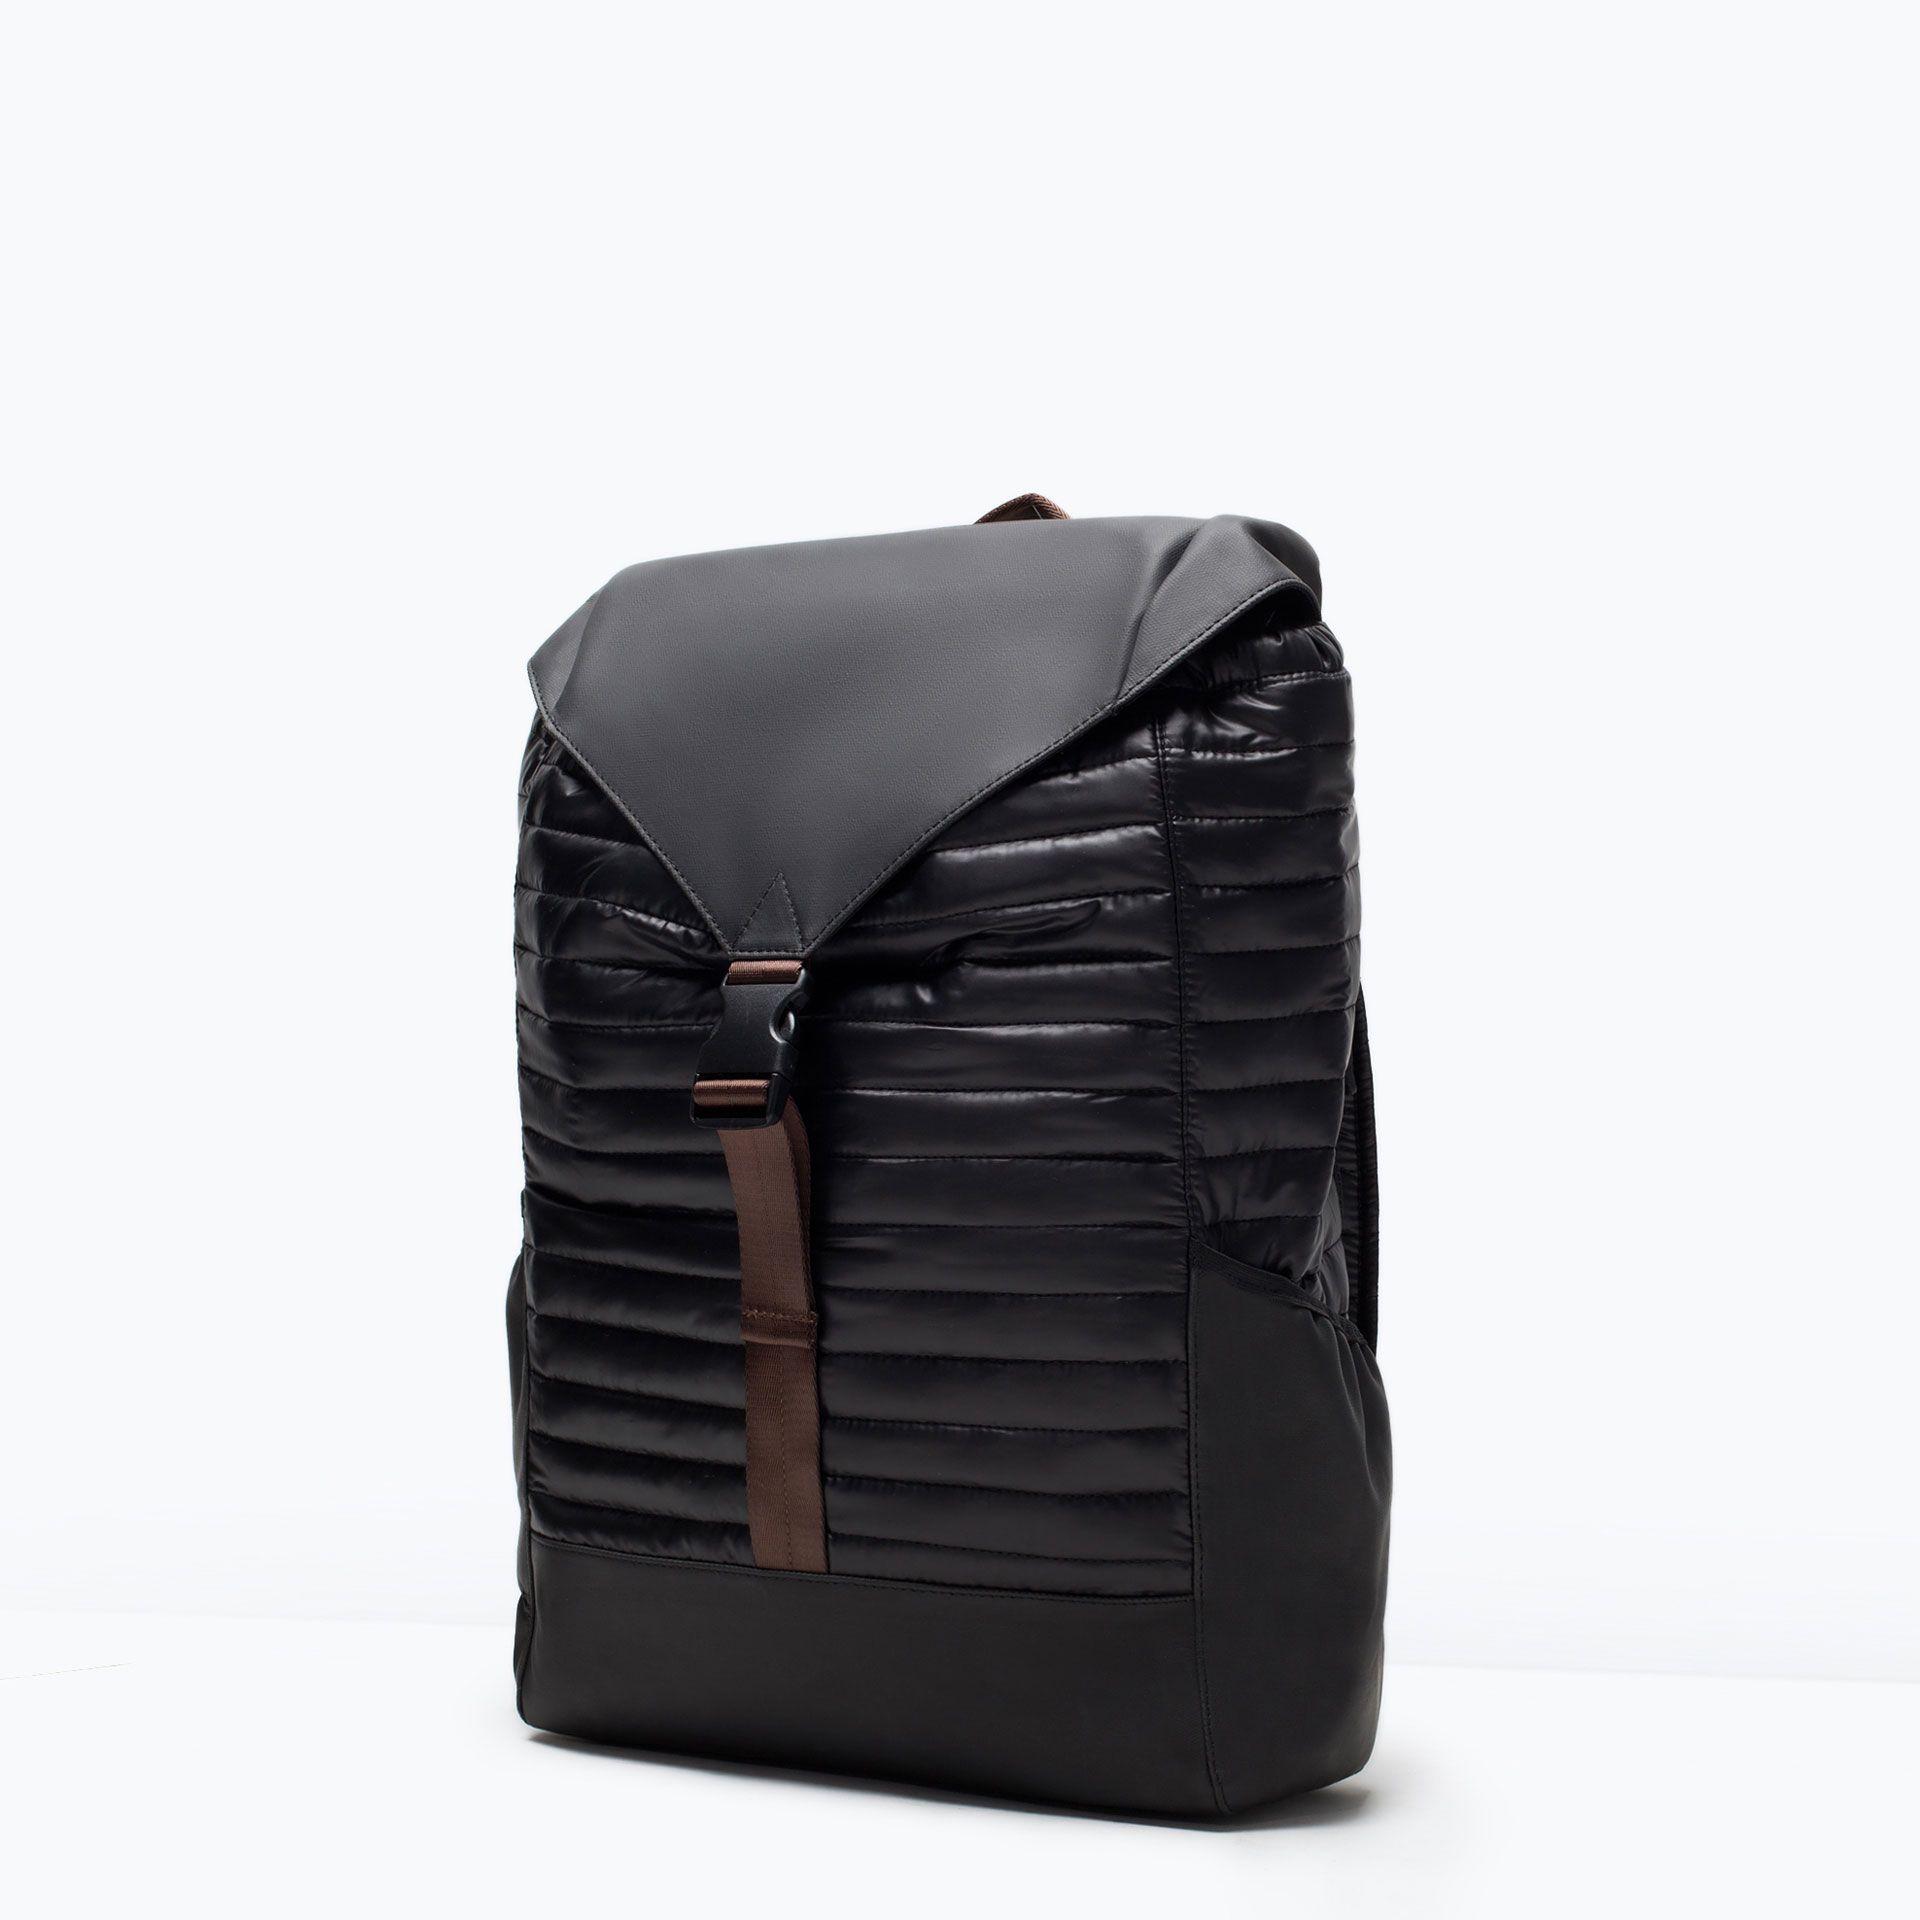 Zara - Quilted Rucksack   Men's Bags   Pinterest   Bag and Backpacks : black quilted rucksack - Adamdwight.com